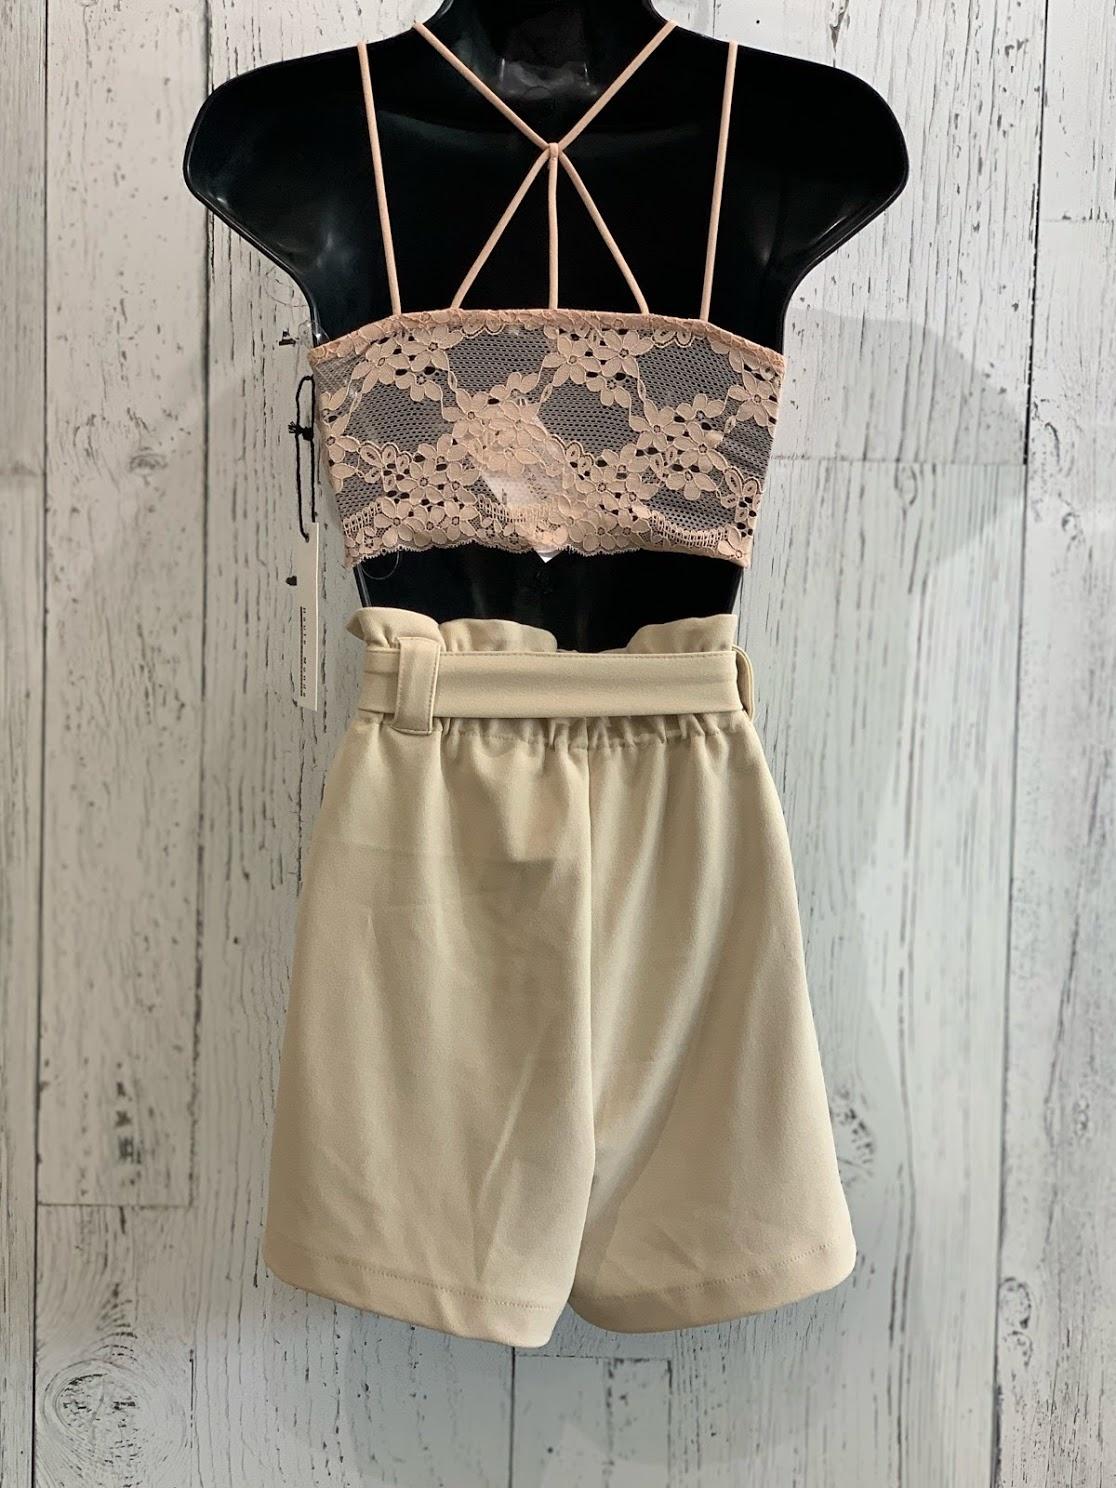 double strap lace bustier top